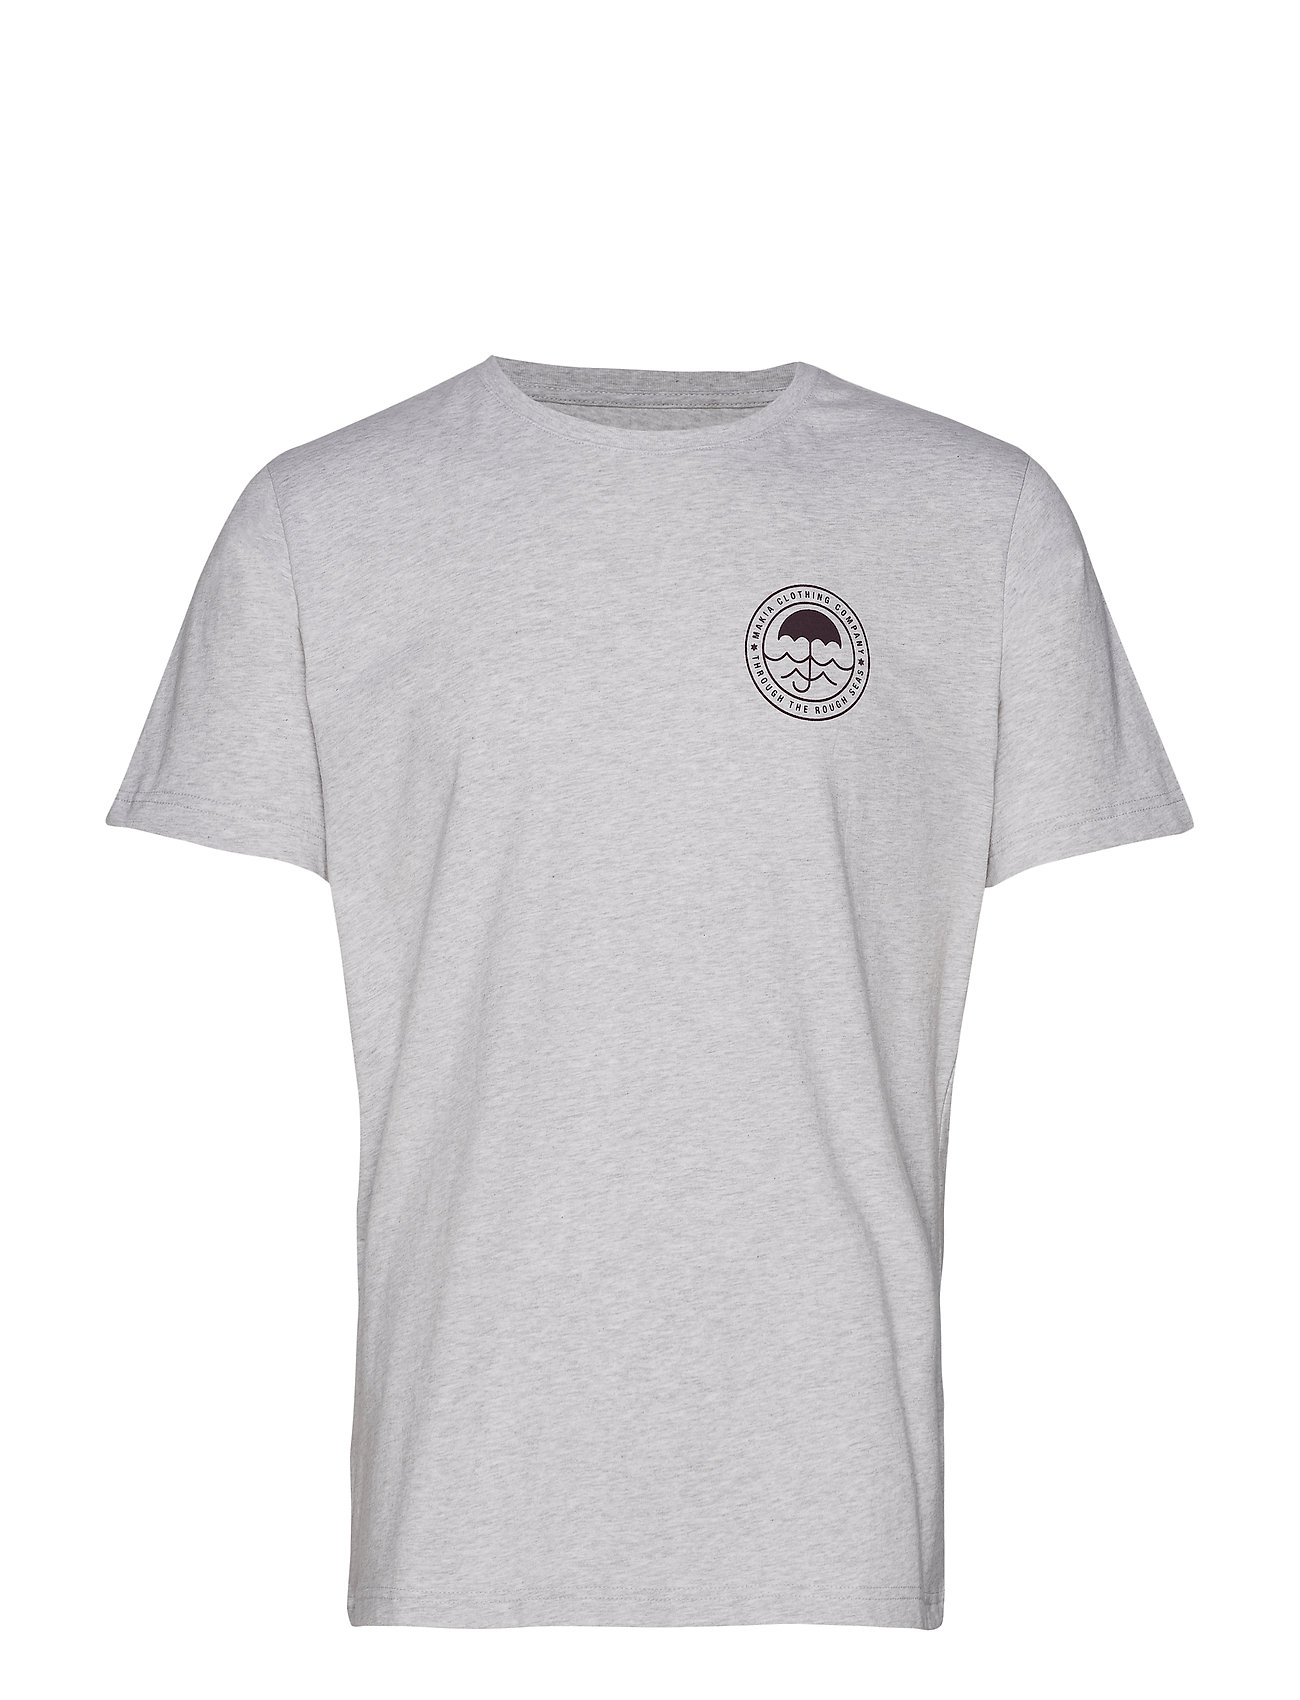 Makia Umbrella T-Shirt - LIGHT GREY